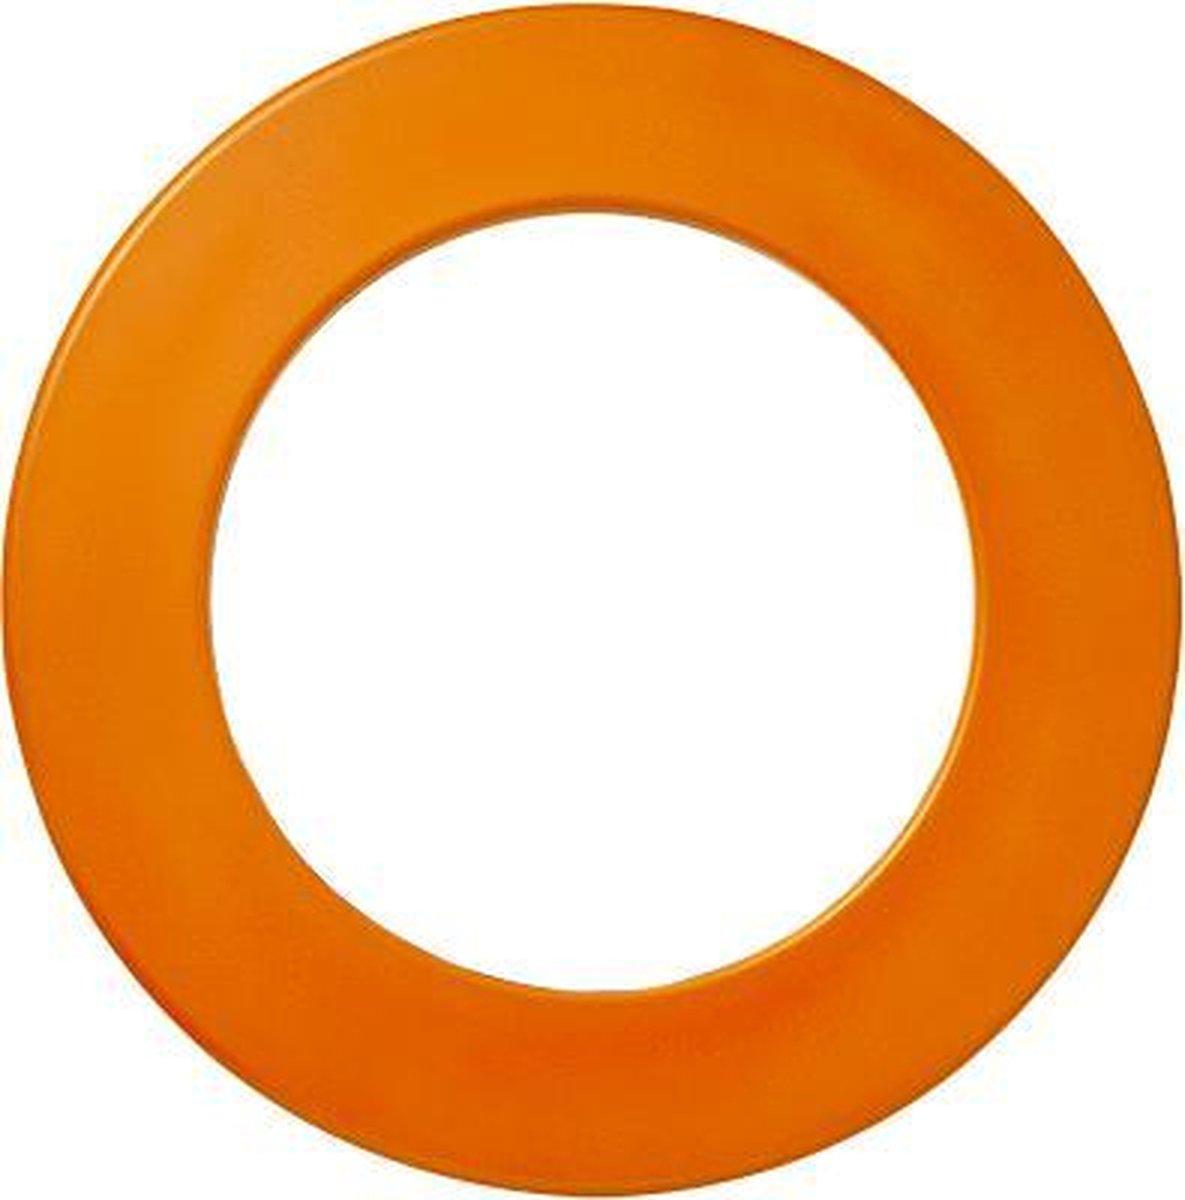 Winmau Dartbord Surround Ring - Plain orange